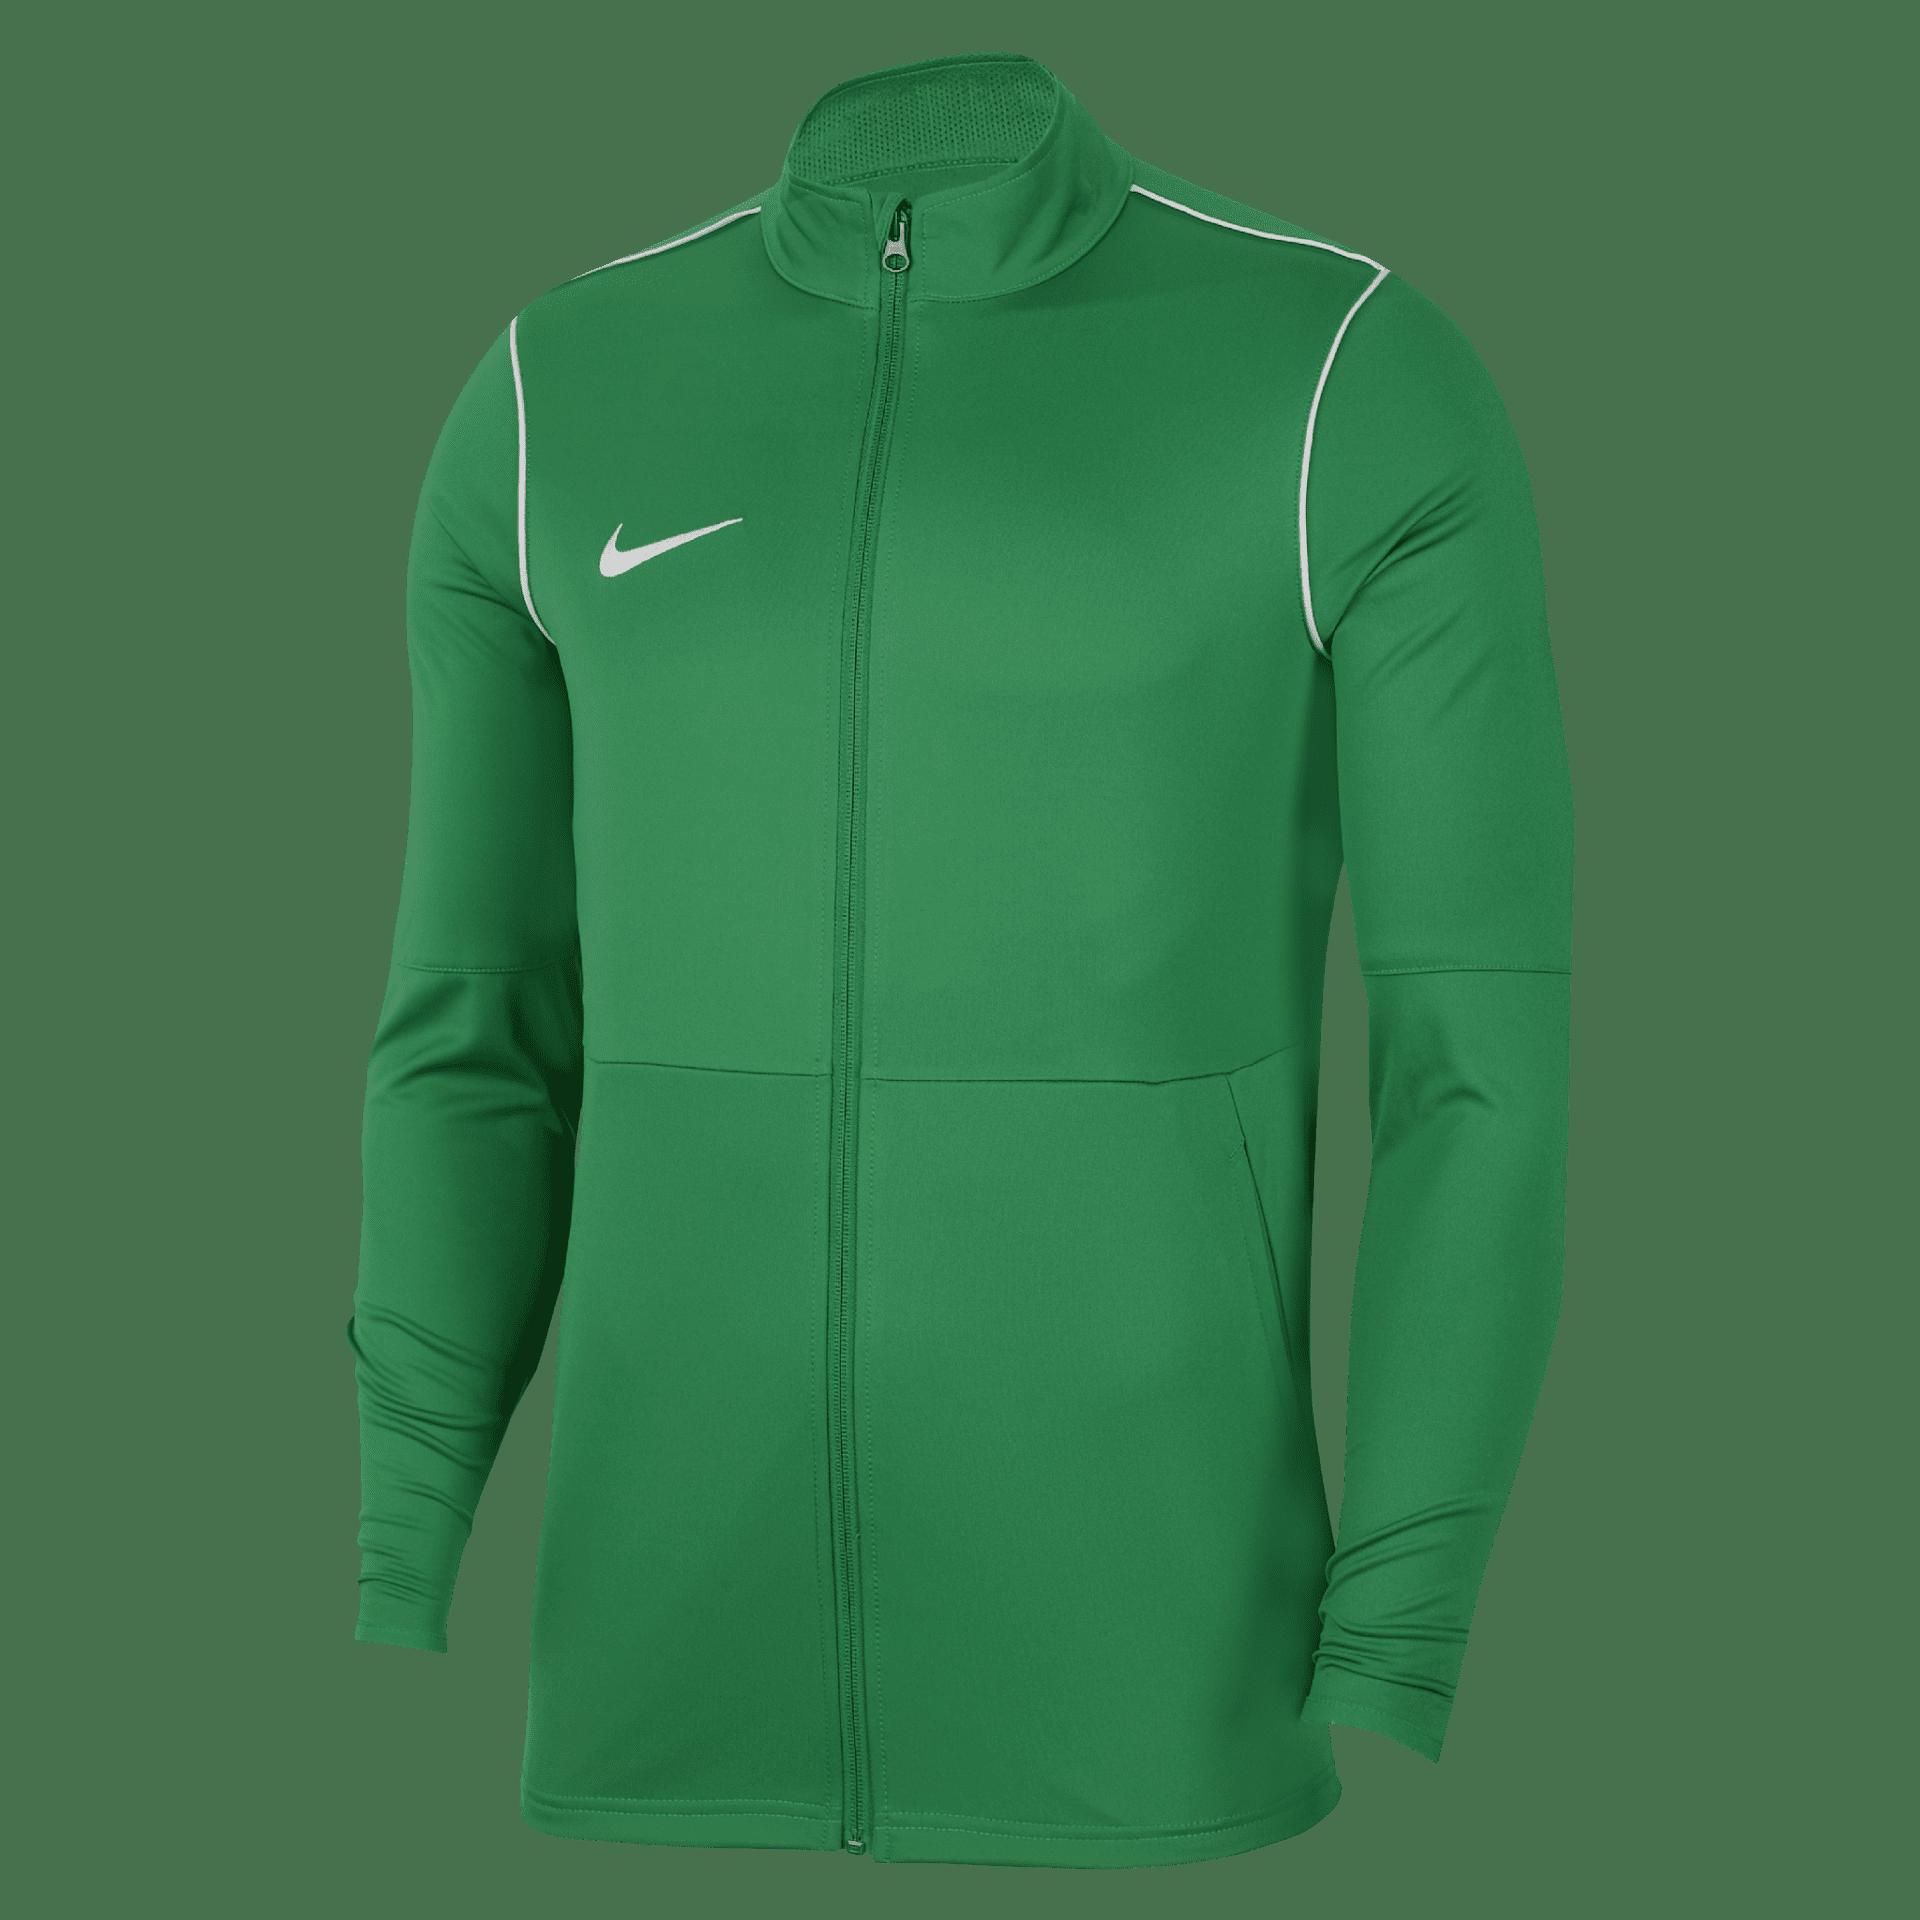 nike park 20 knit track jacket size xxl mens  3  28625 p